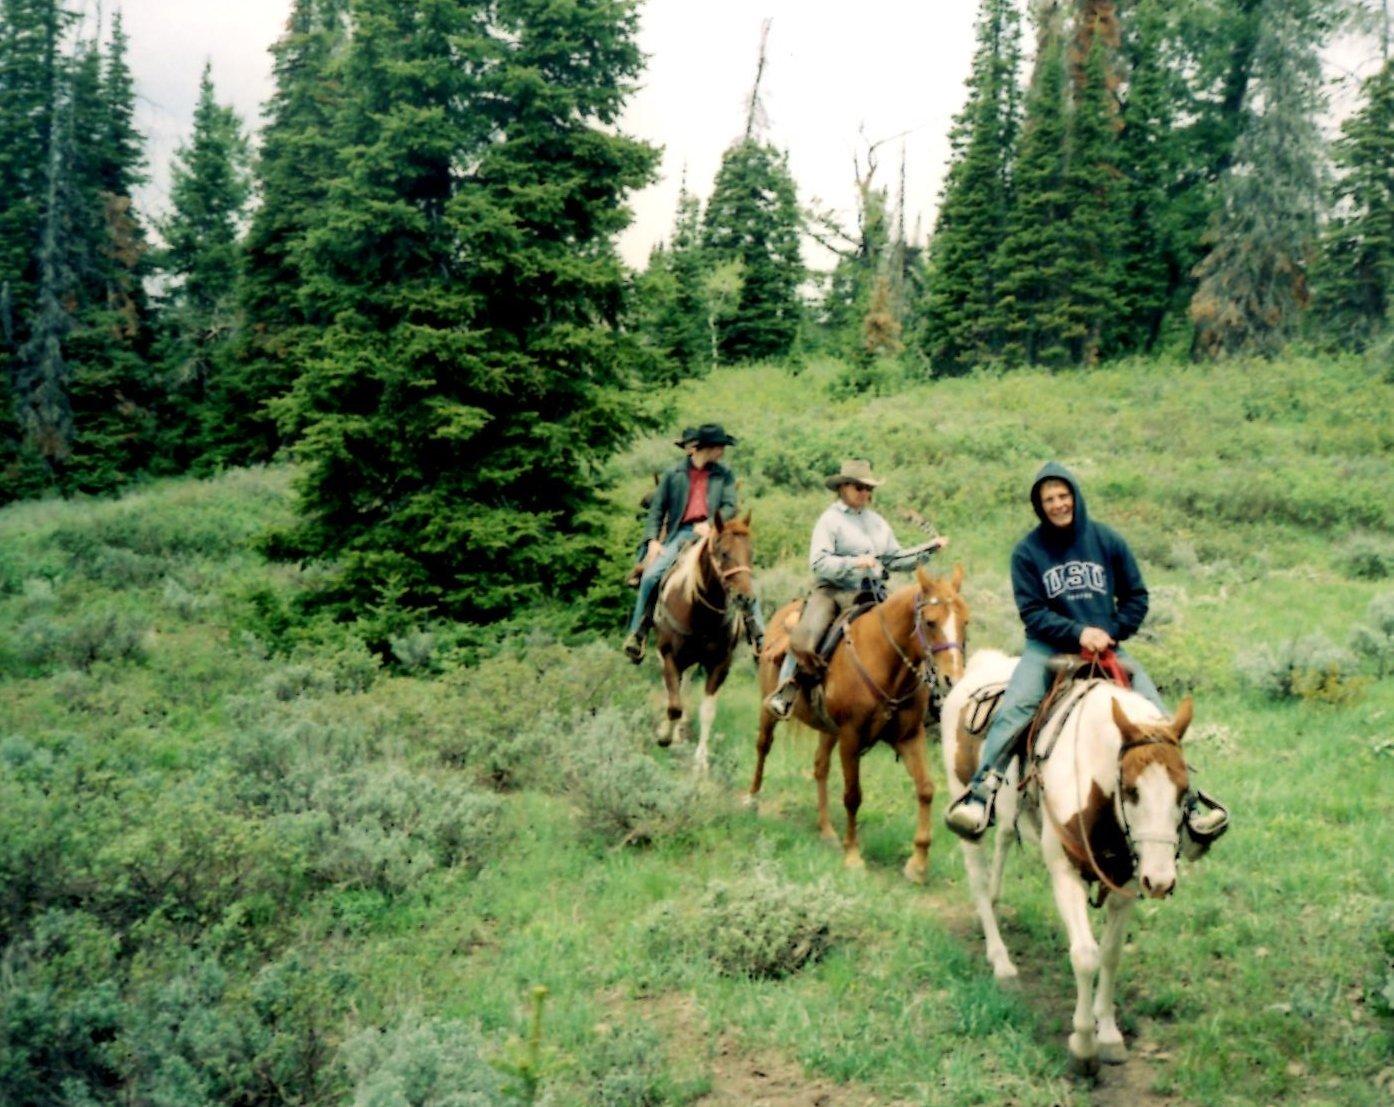 Wyoming horse back mountain trip Bridger - Teton National Forest in Western Wyoming